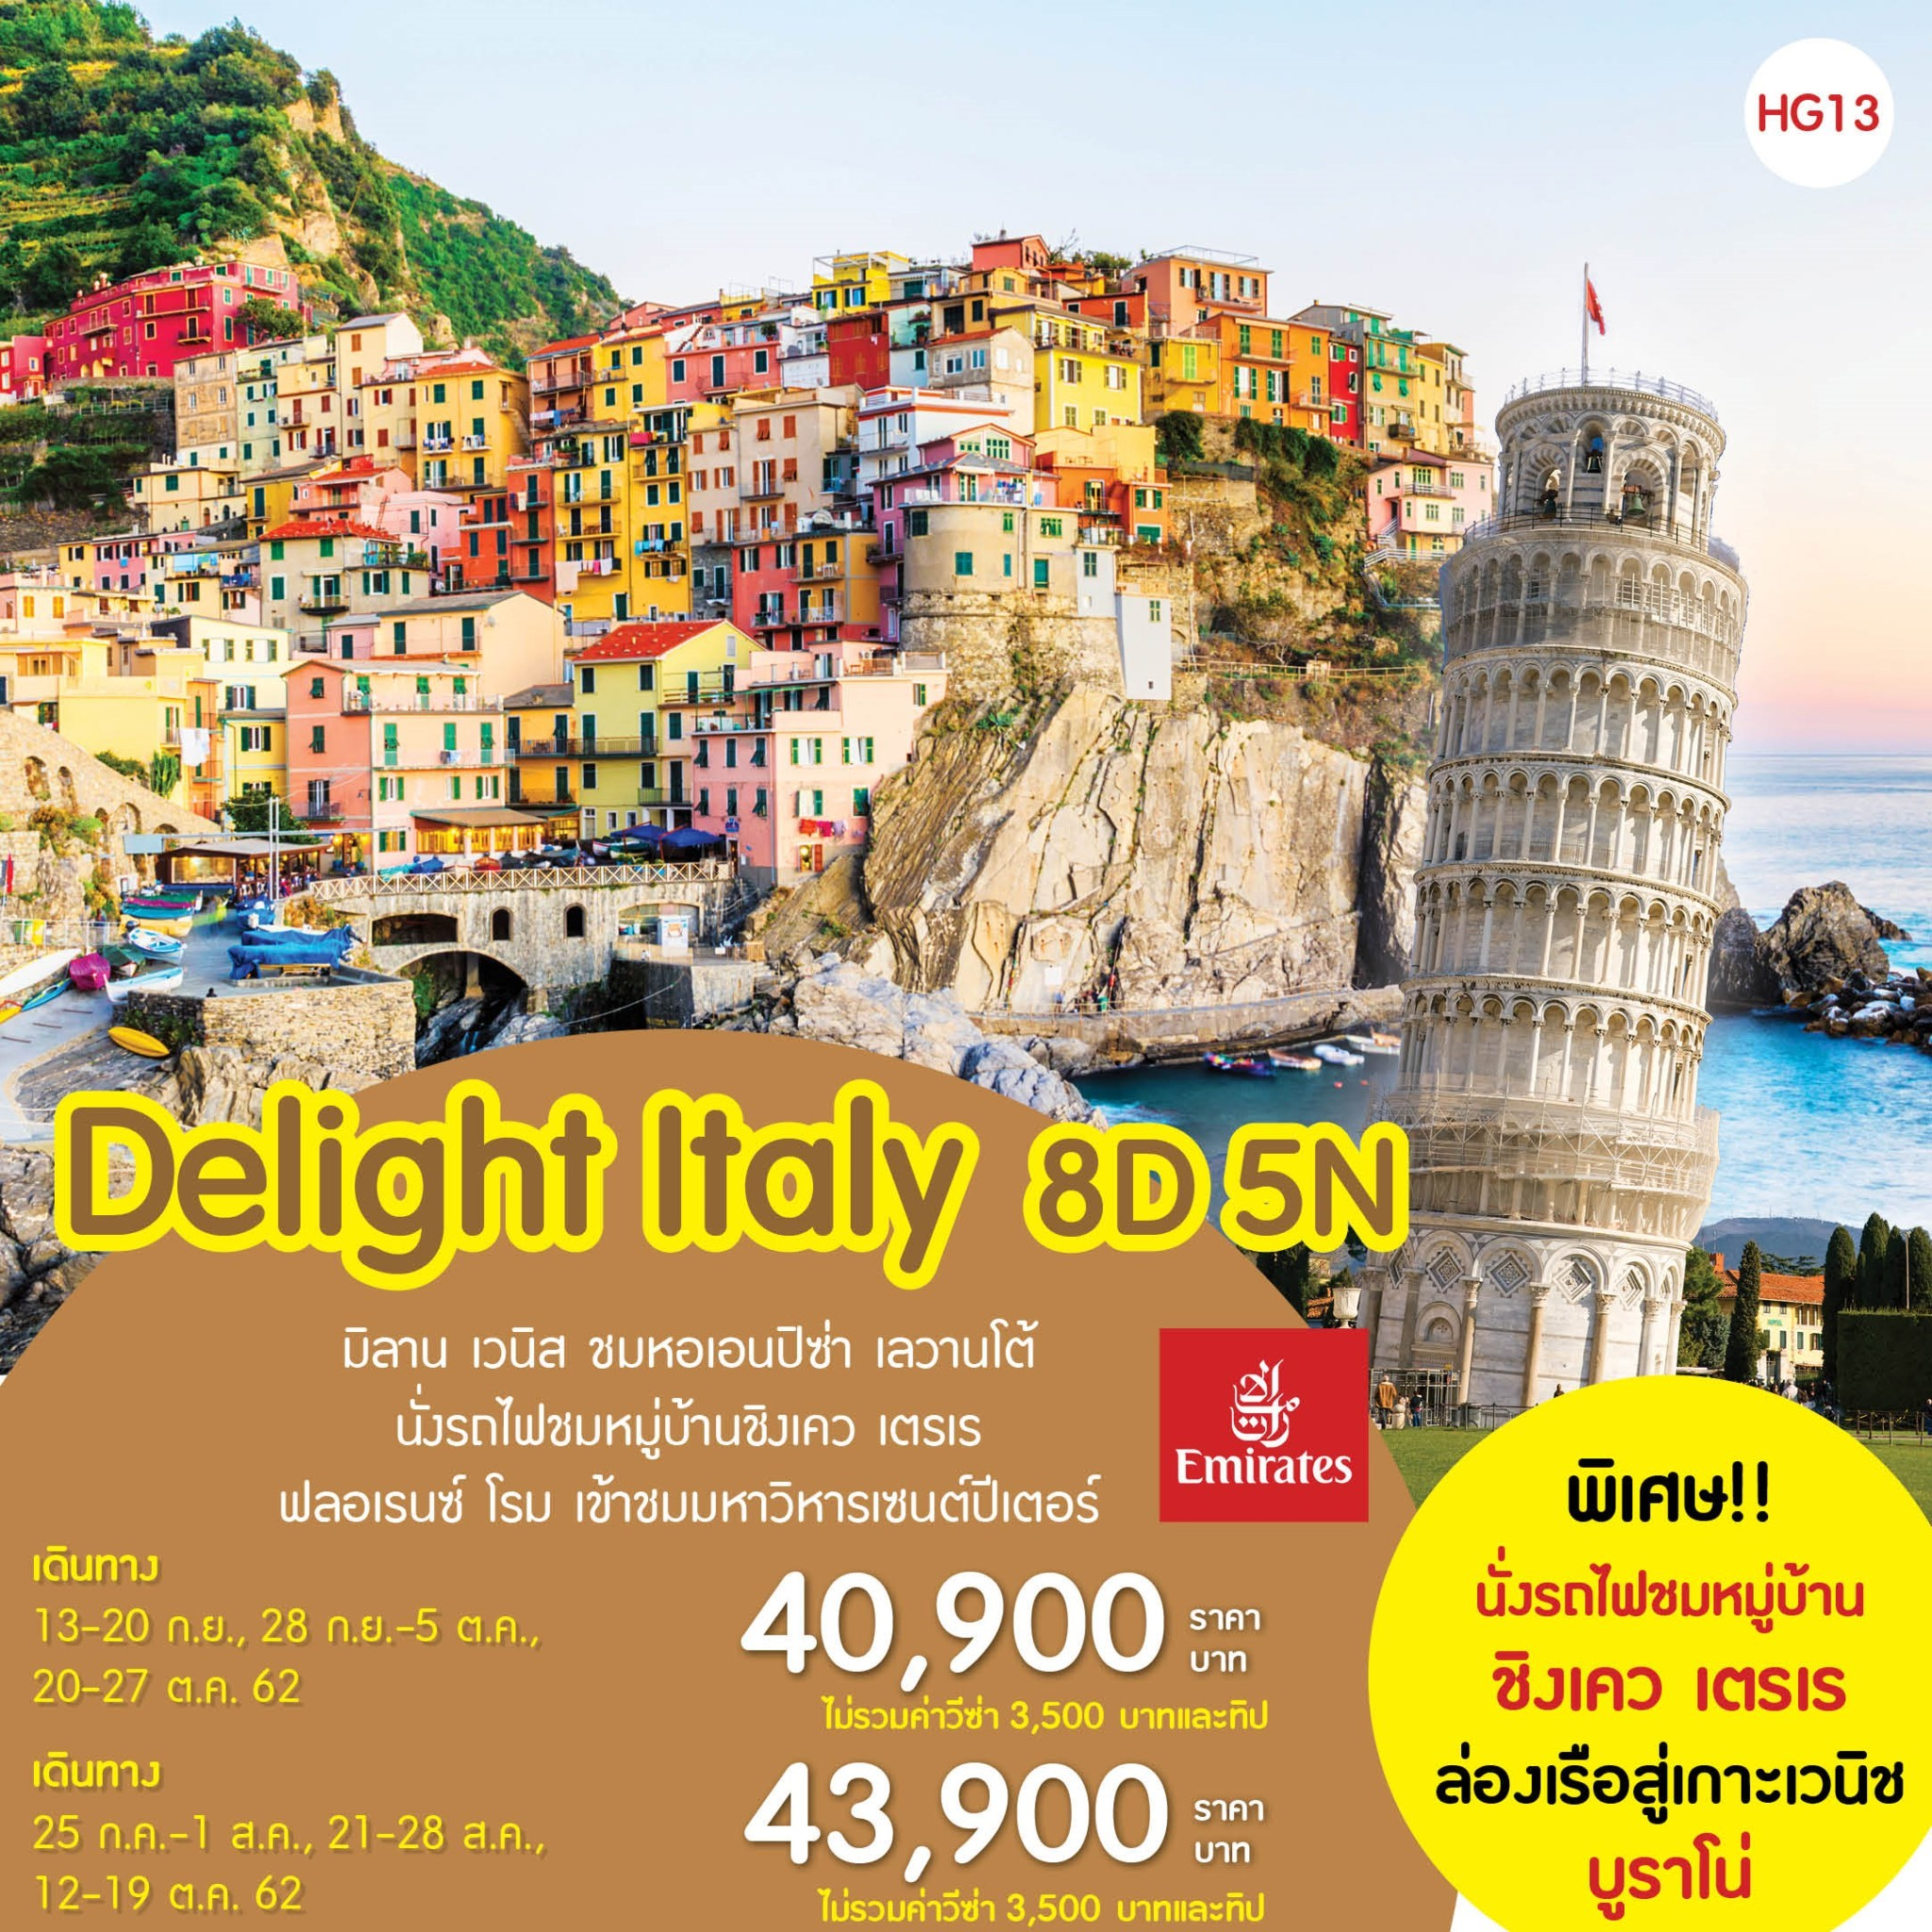 Delight Italy 8D5N